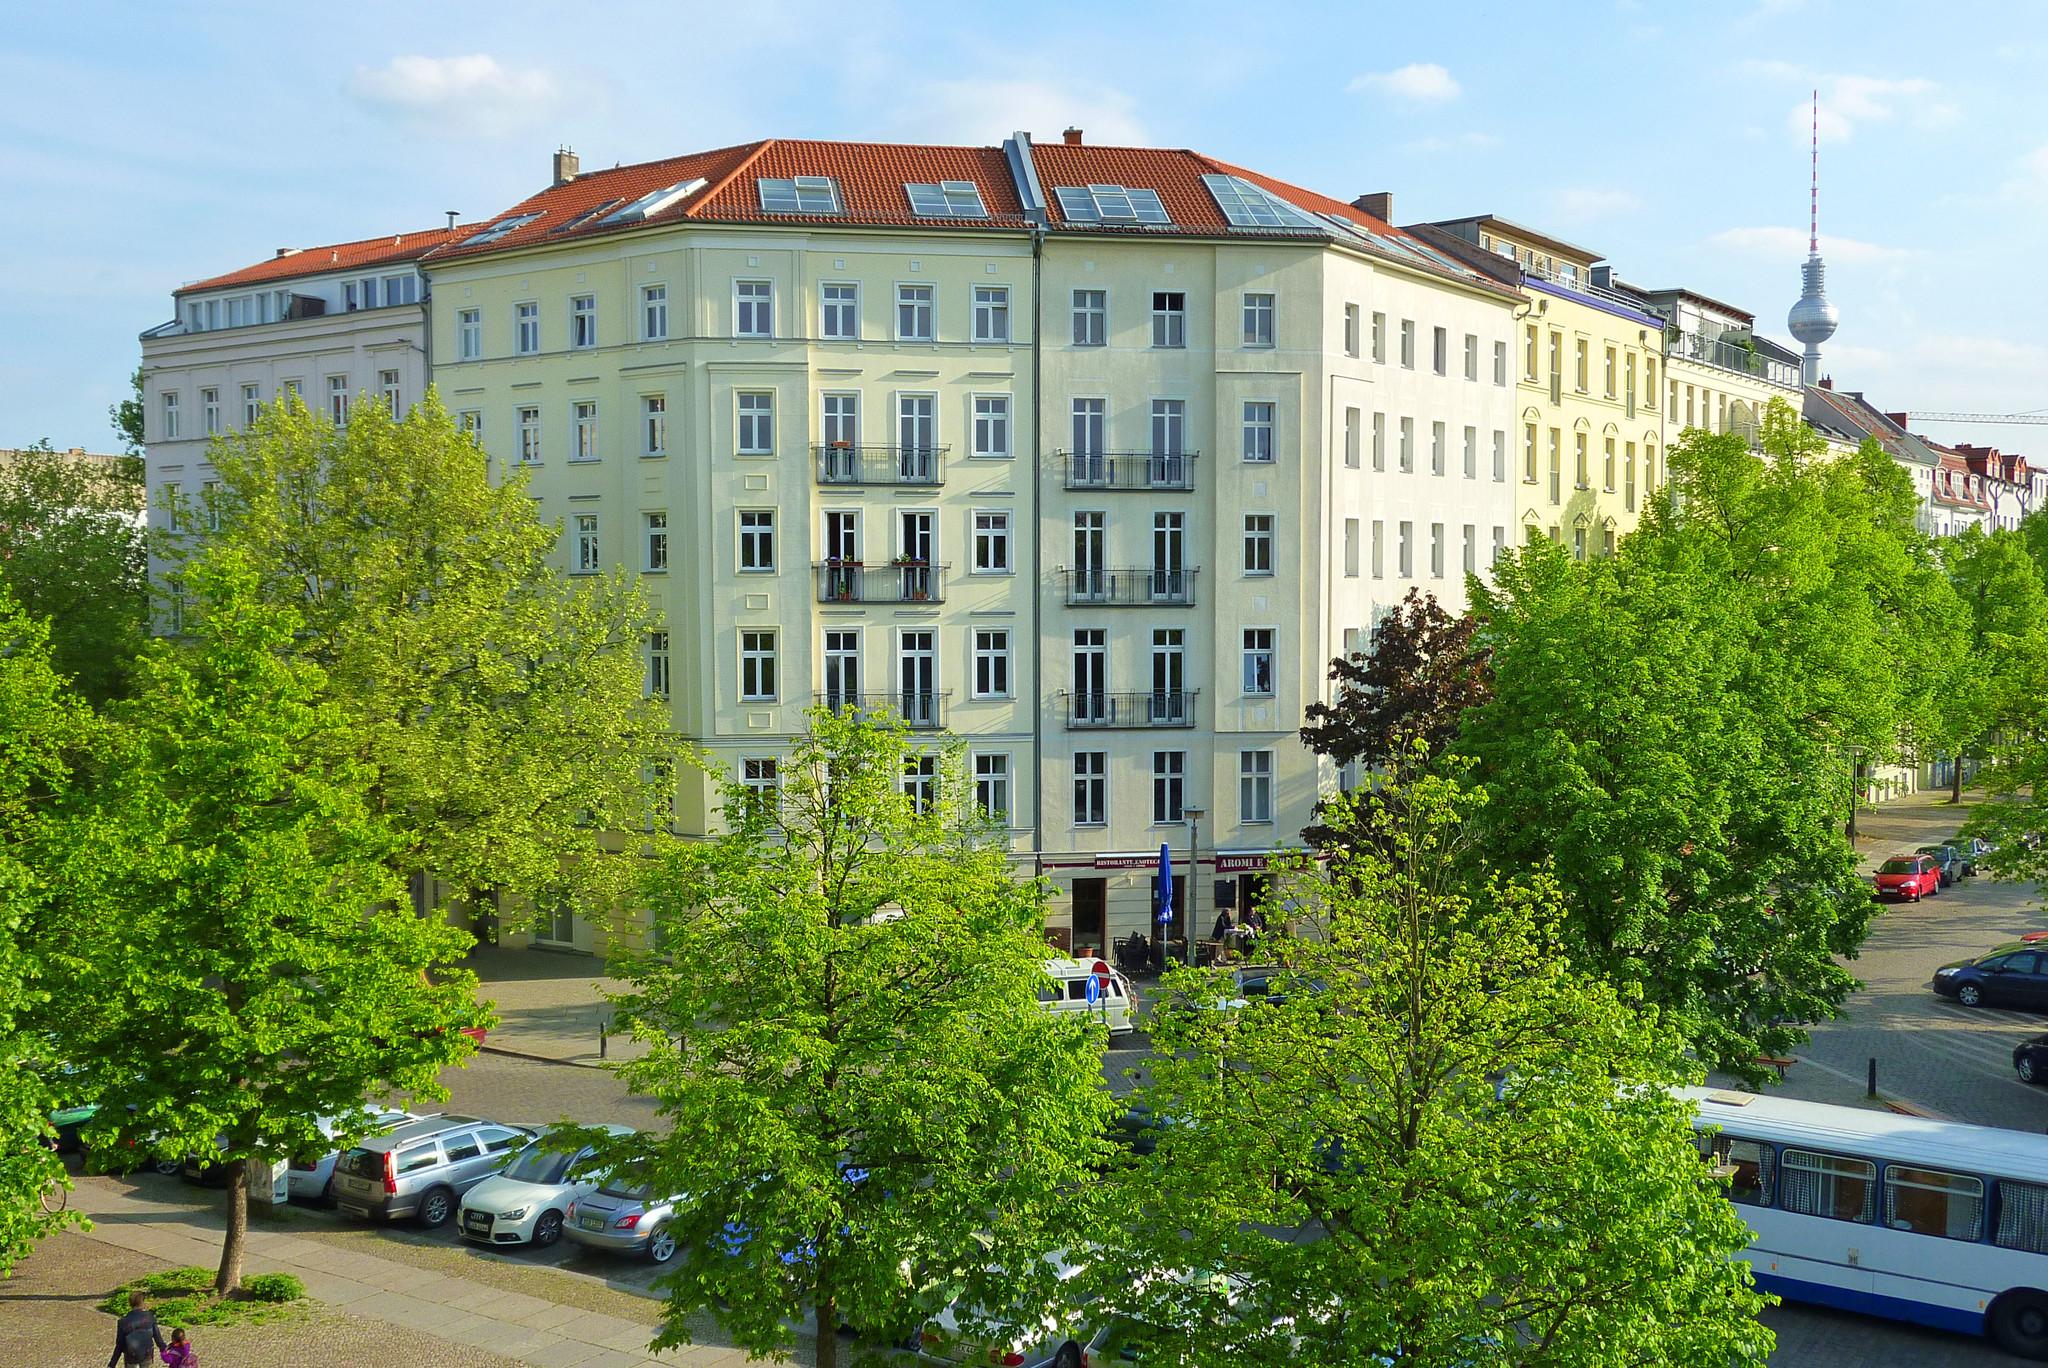 Georg Immobilien - Maklerbüro in Berlin-Prenzlauer Berg